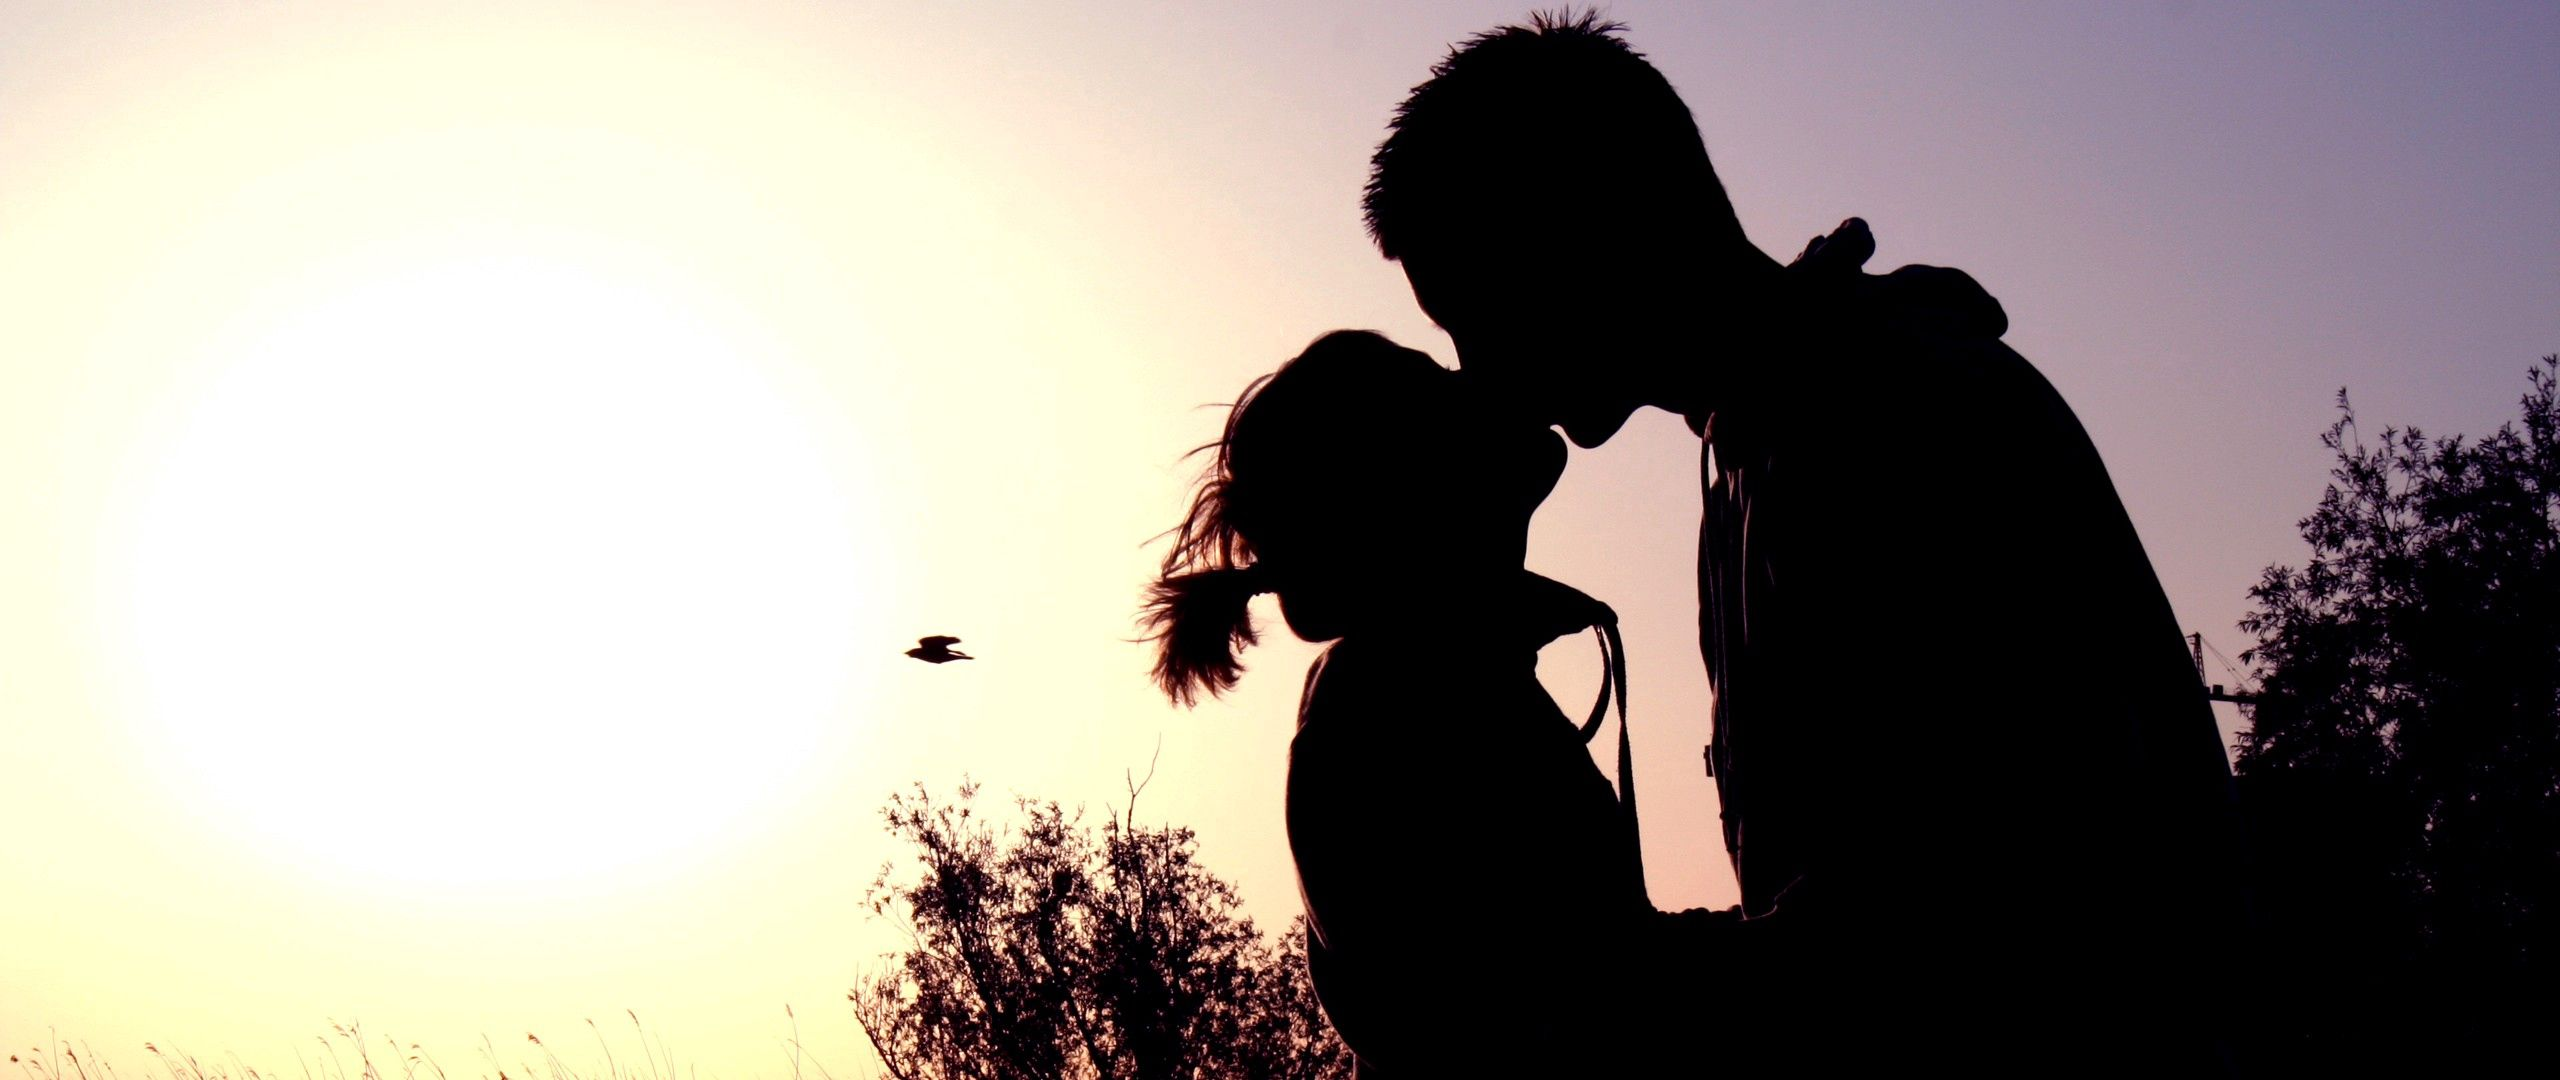 2560x1080 Wallpaper couple, shadow, sunset, kissing, hugging, romance